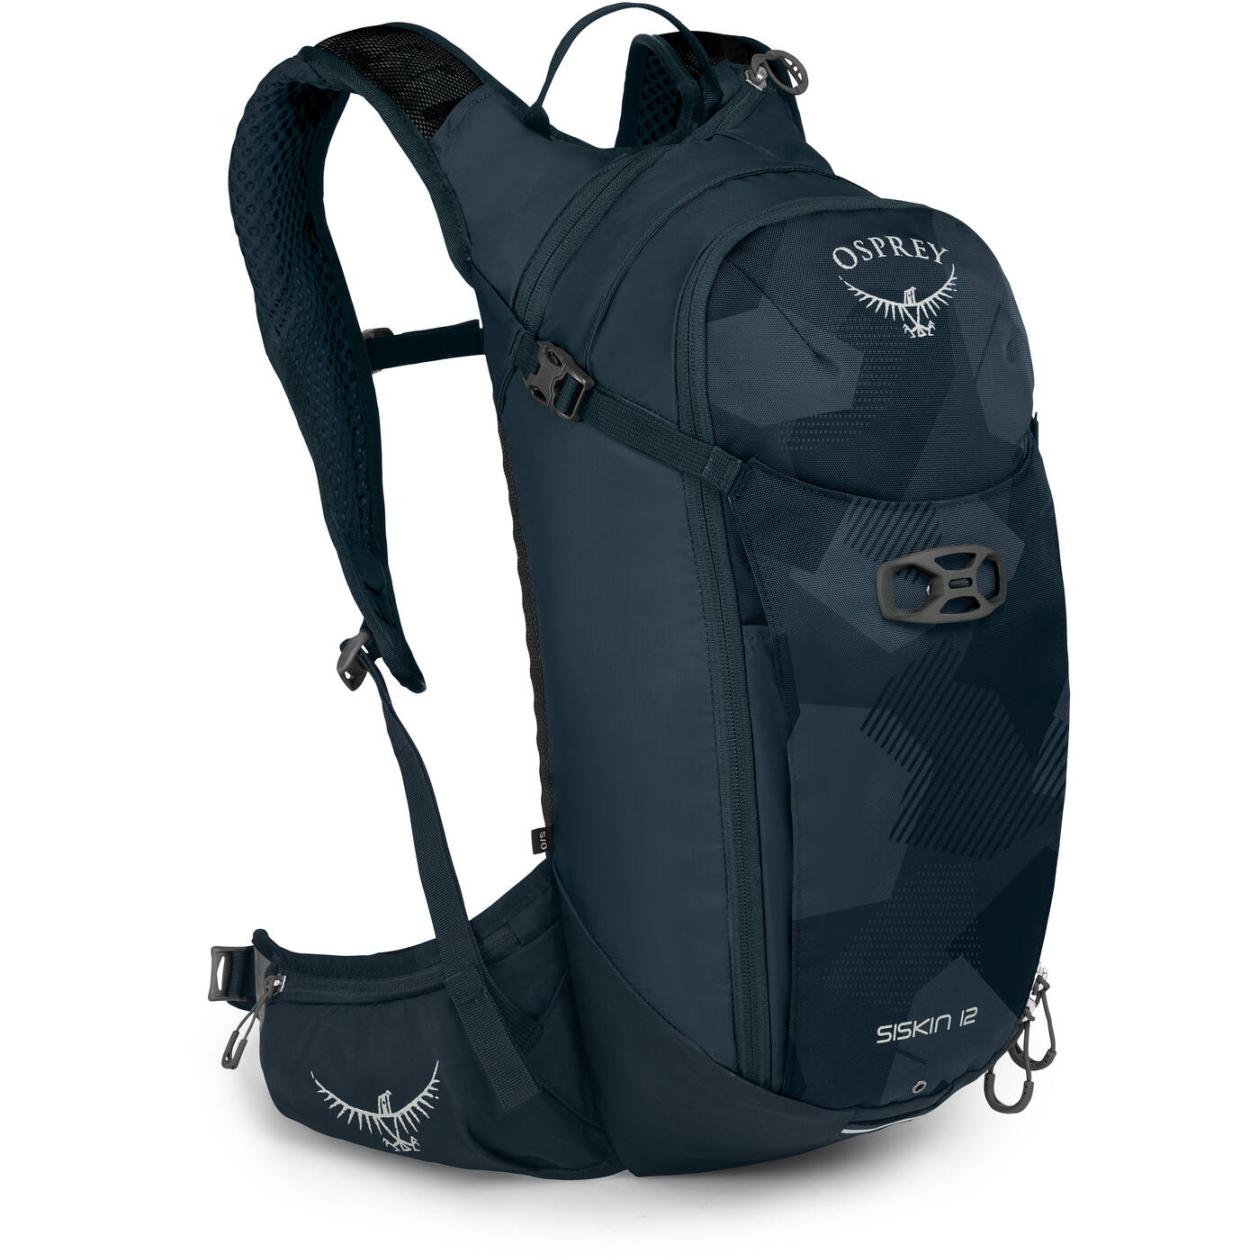 Osprey Siskin 12 Hydration Backpack - Slate Blue